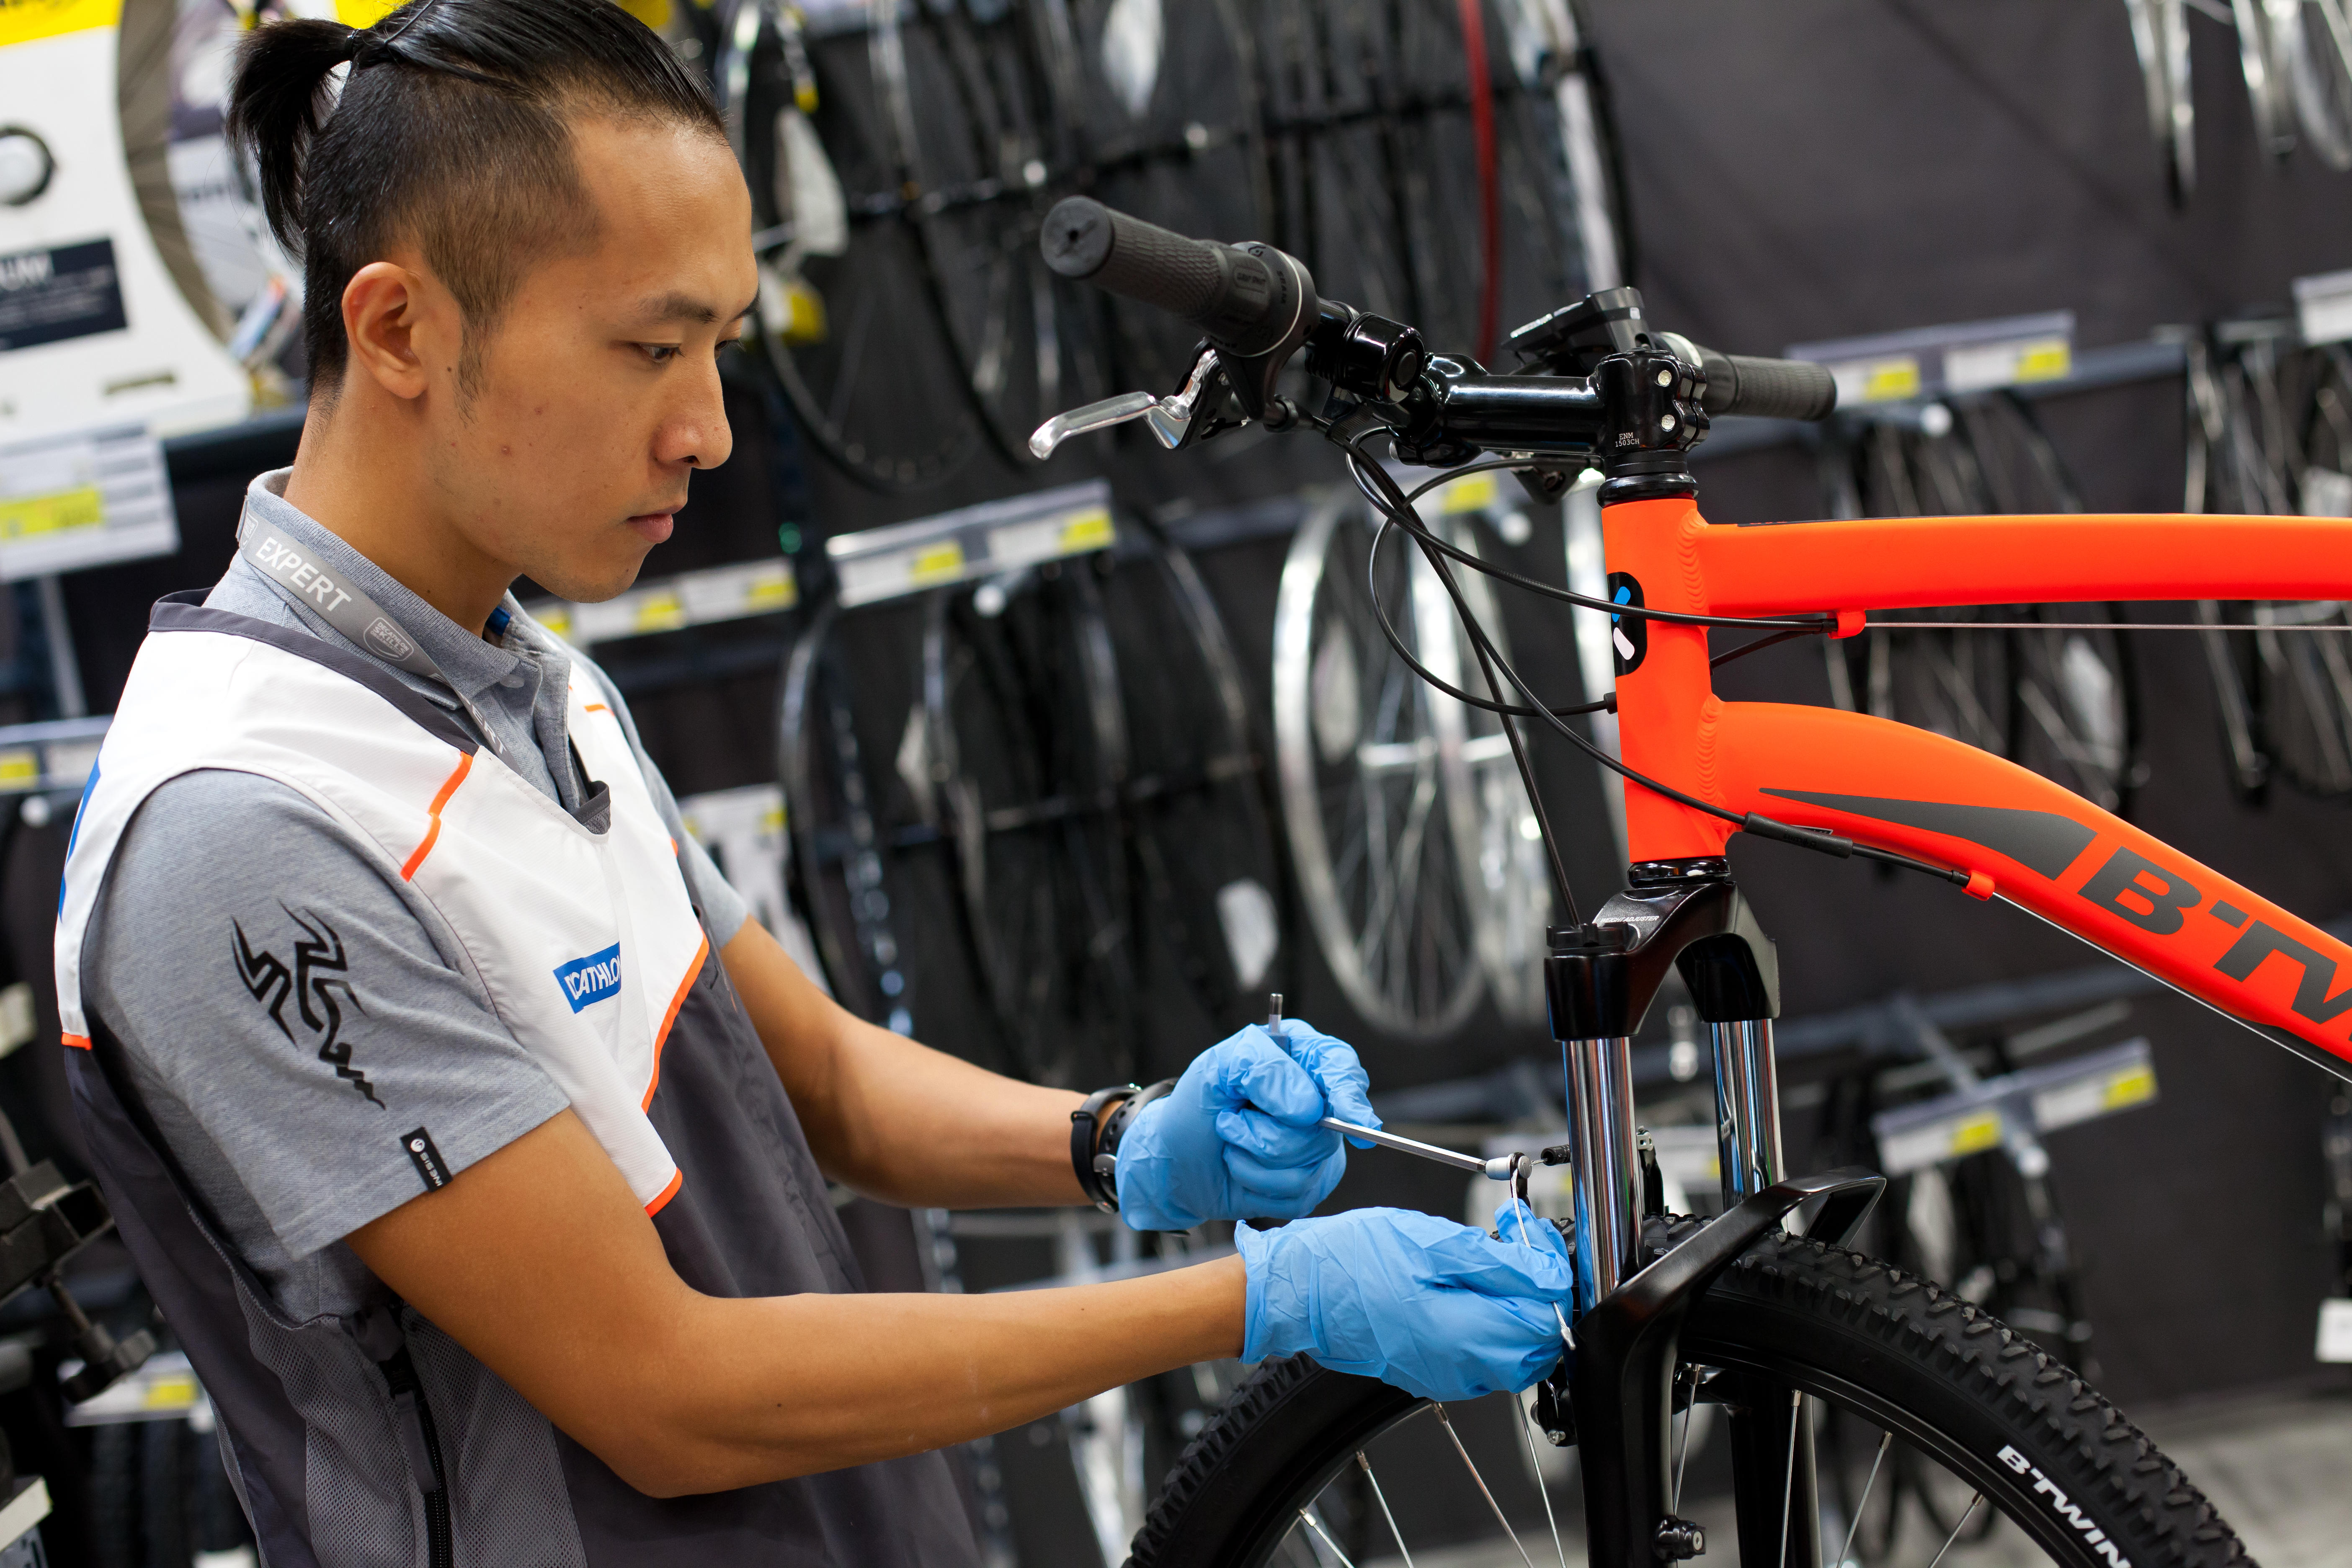 Bike Safety Check-Up